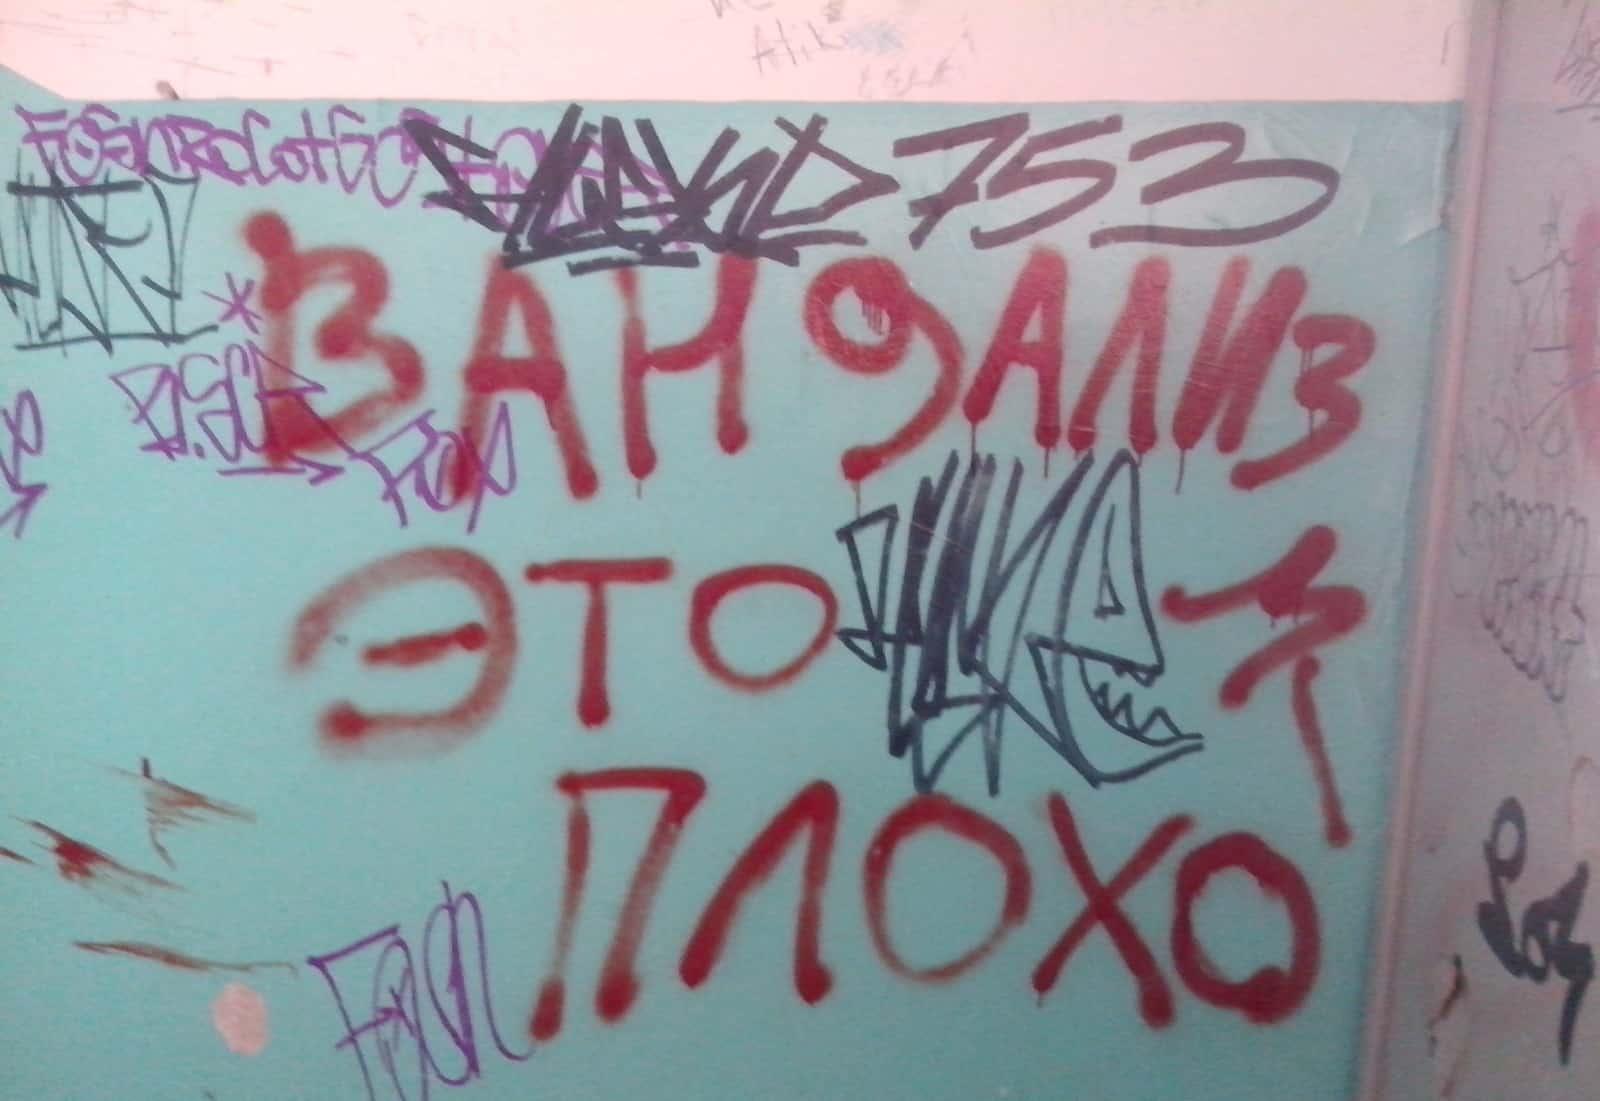 вандализм - это плохо